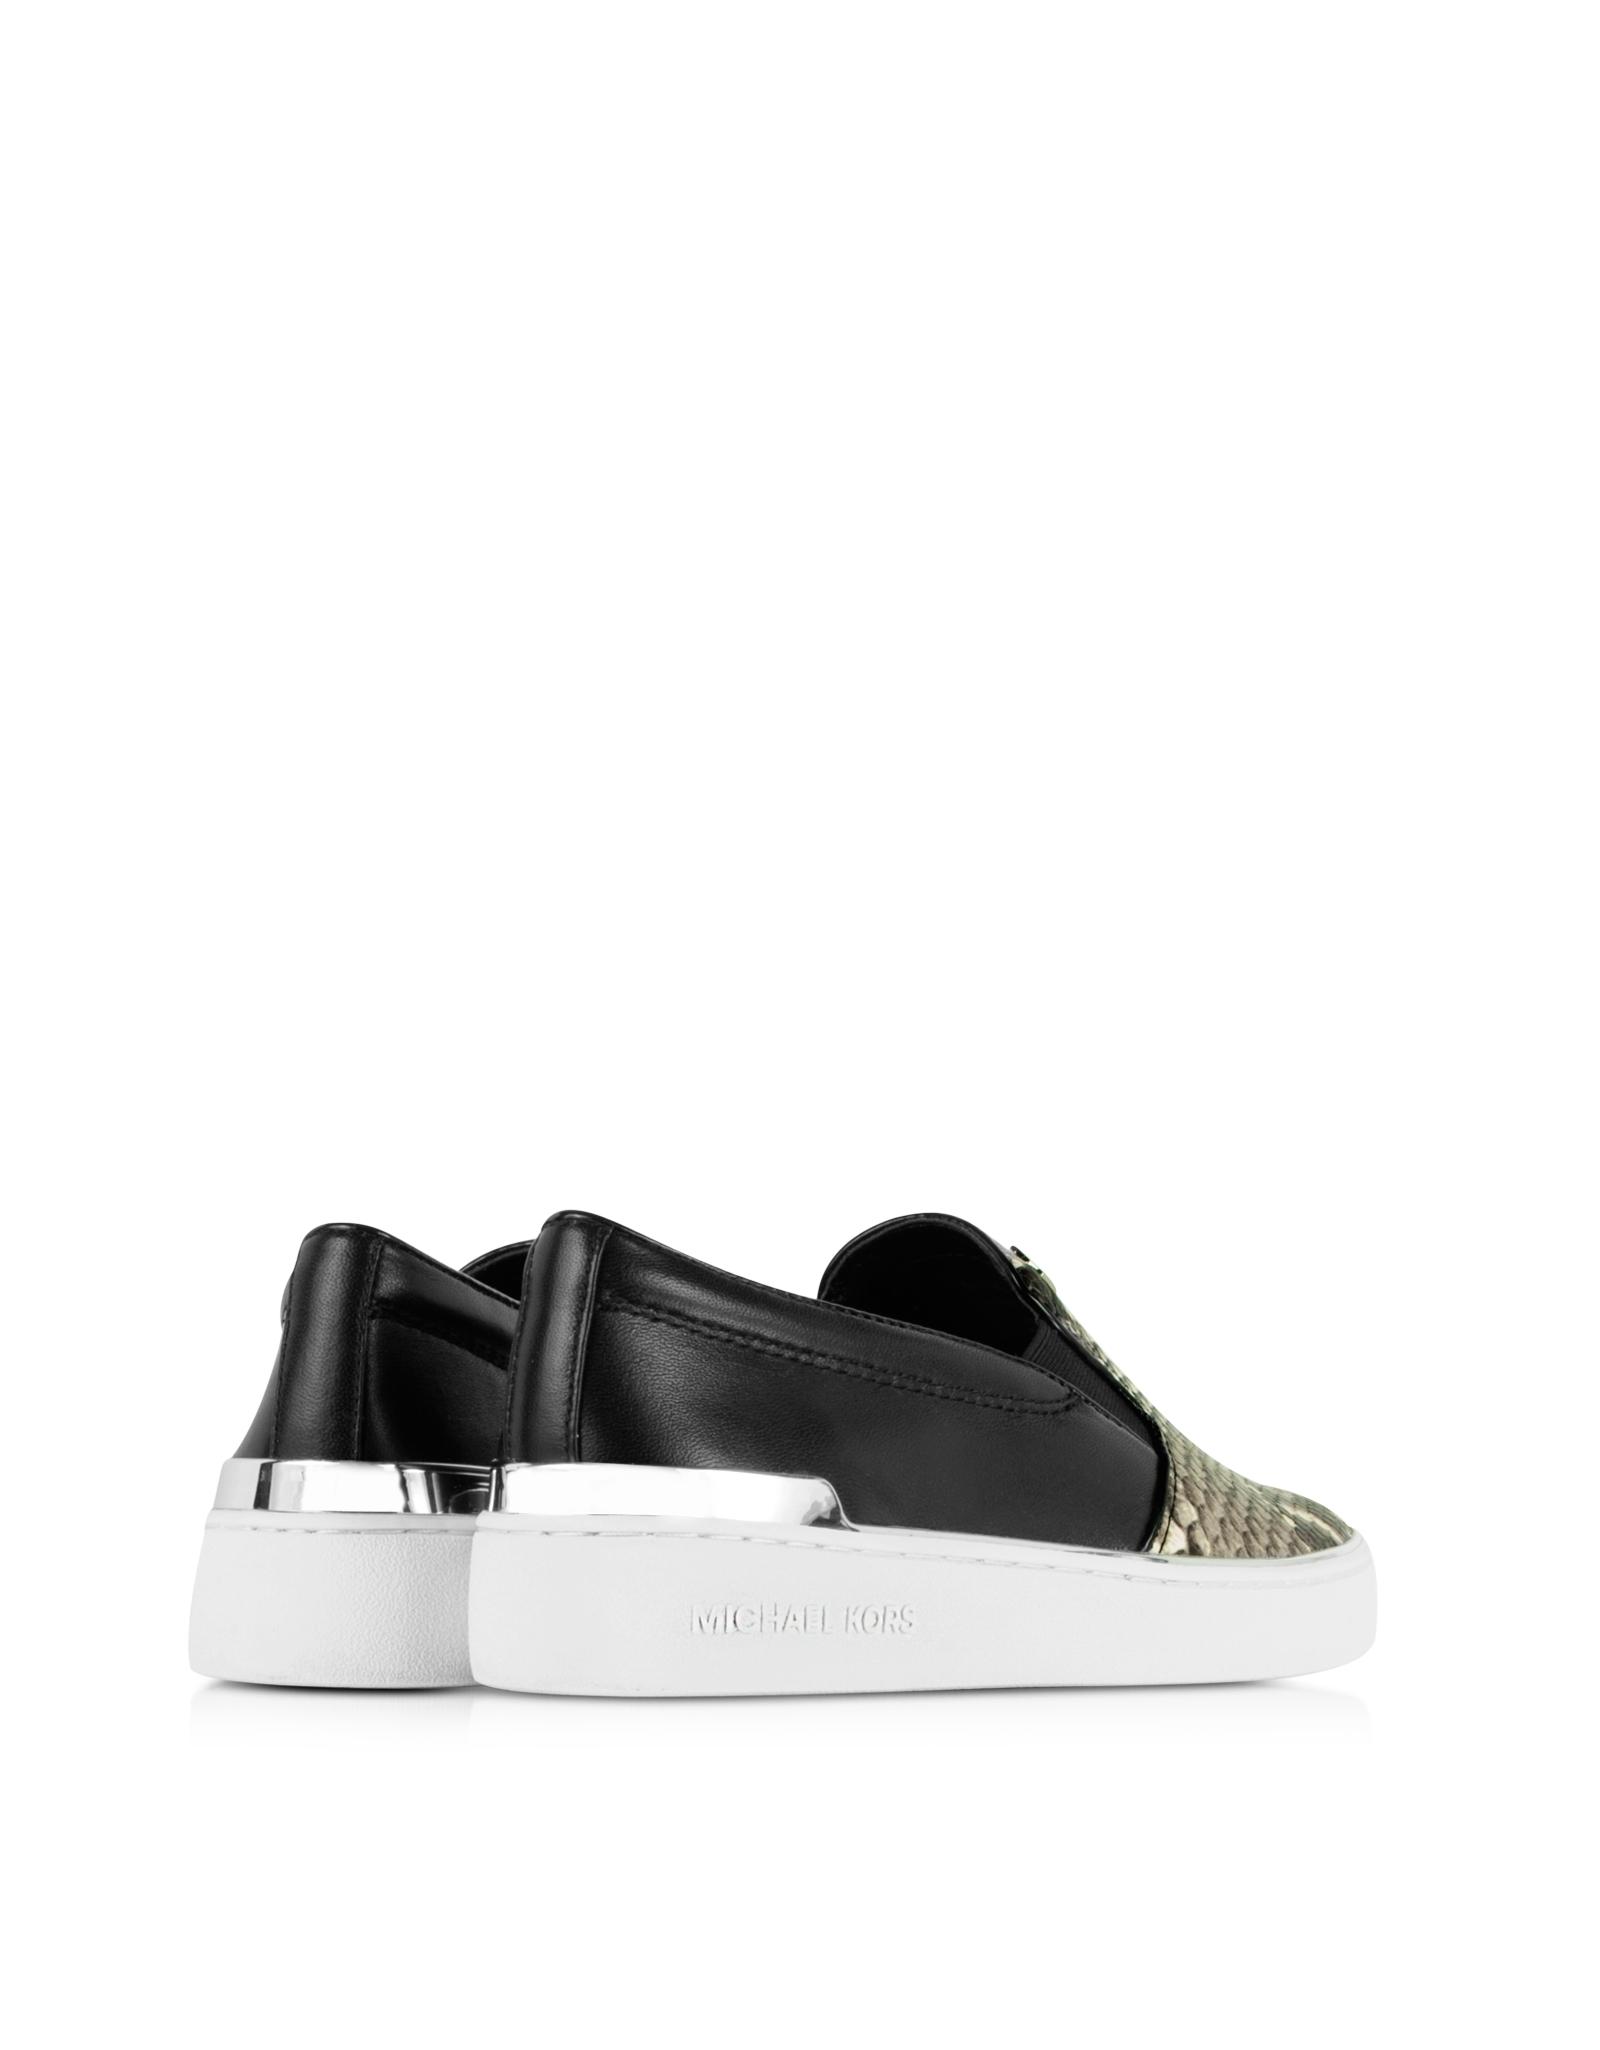 michael kors kyle embossed snake leather slip on sneaker. Black Bedroom Furniture Sets. Home Design Ideas